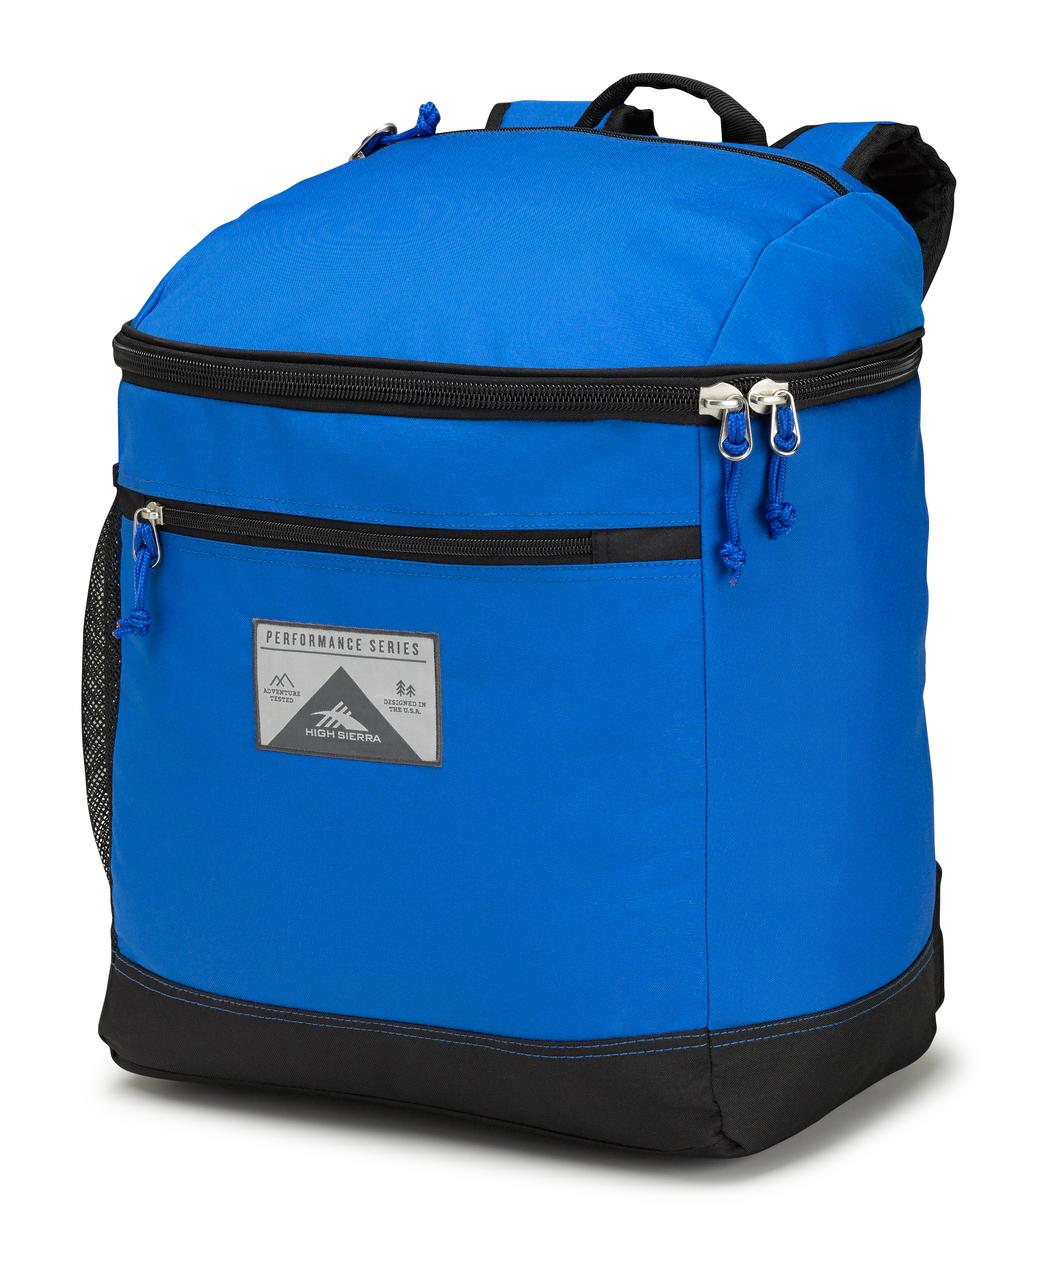 Best Ski Bag For Airline Travel